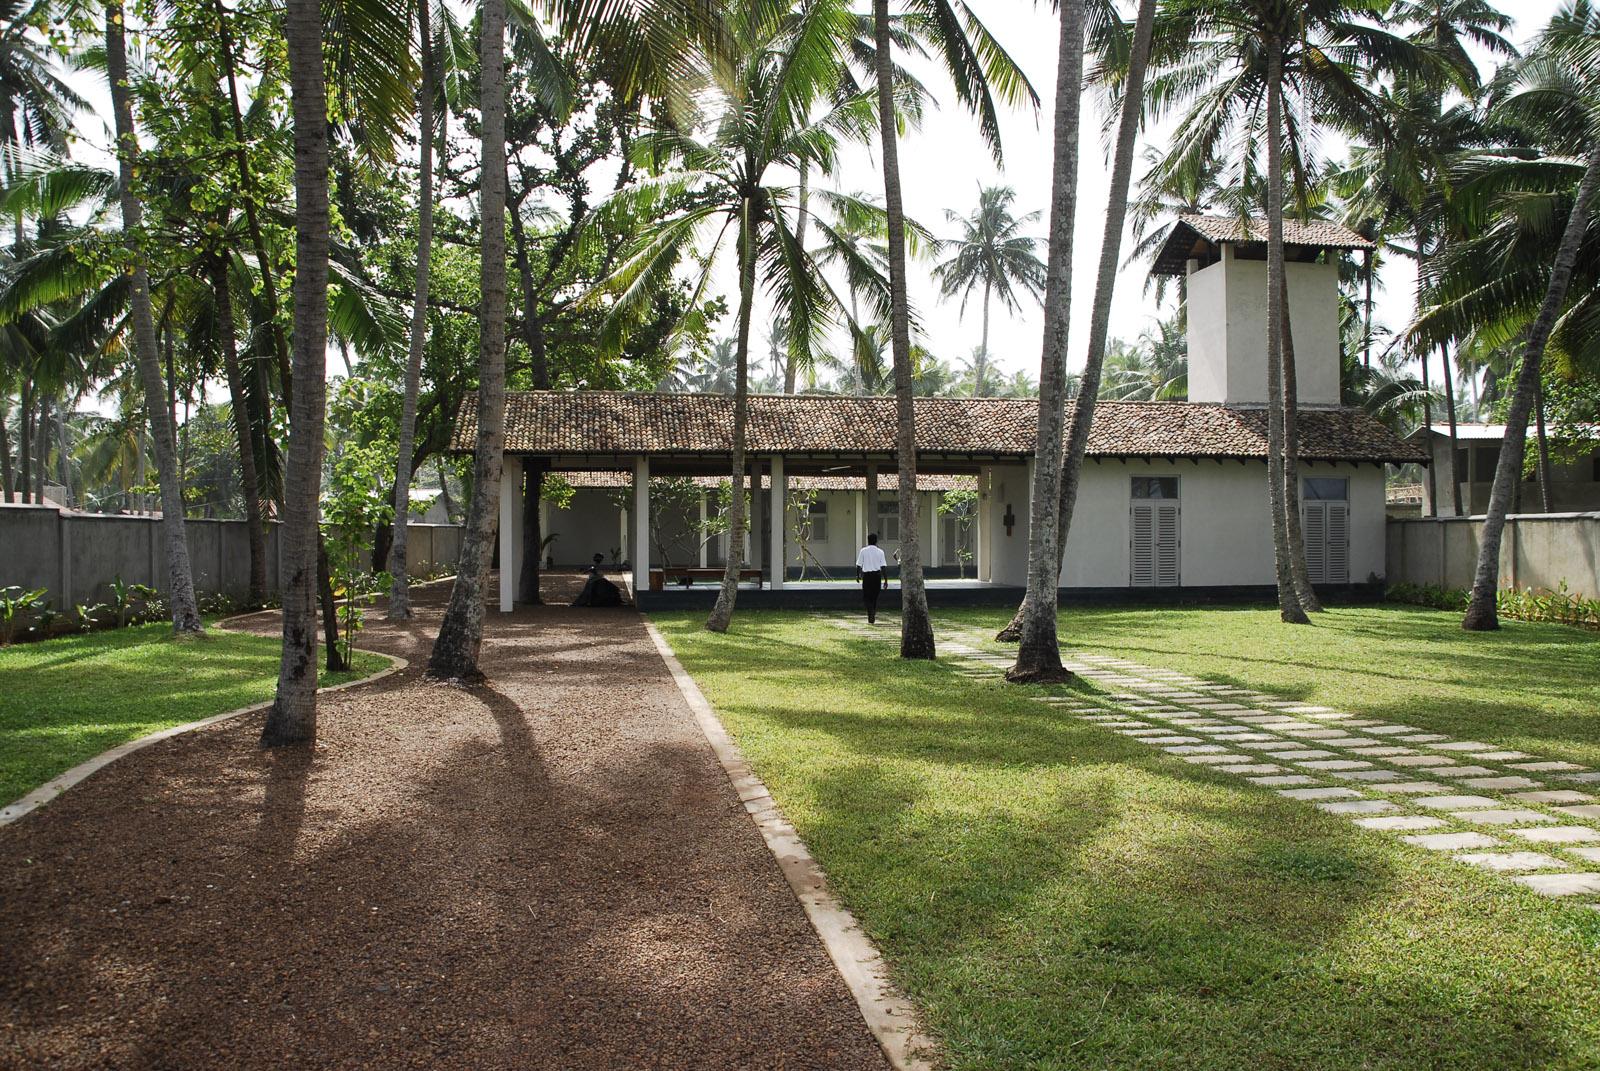 SRI LANKA COMMUNITY CENTRE